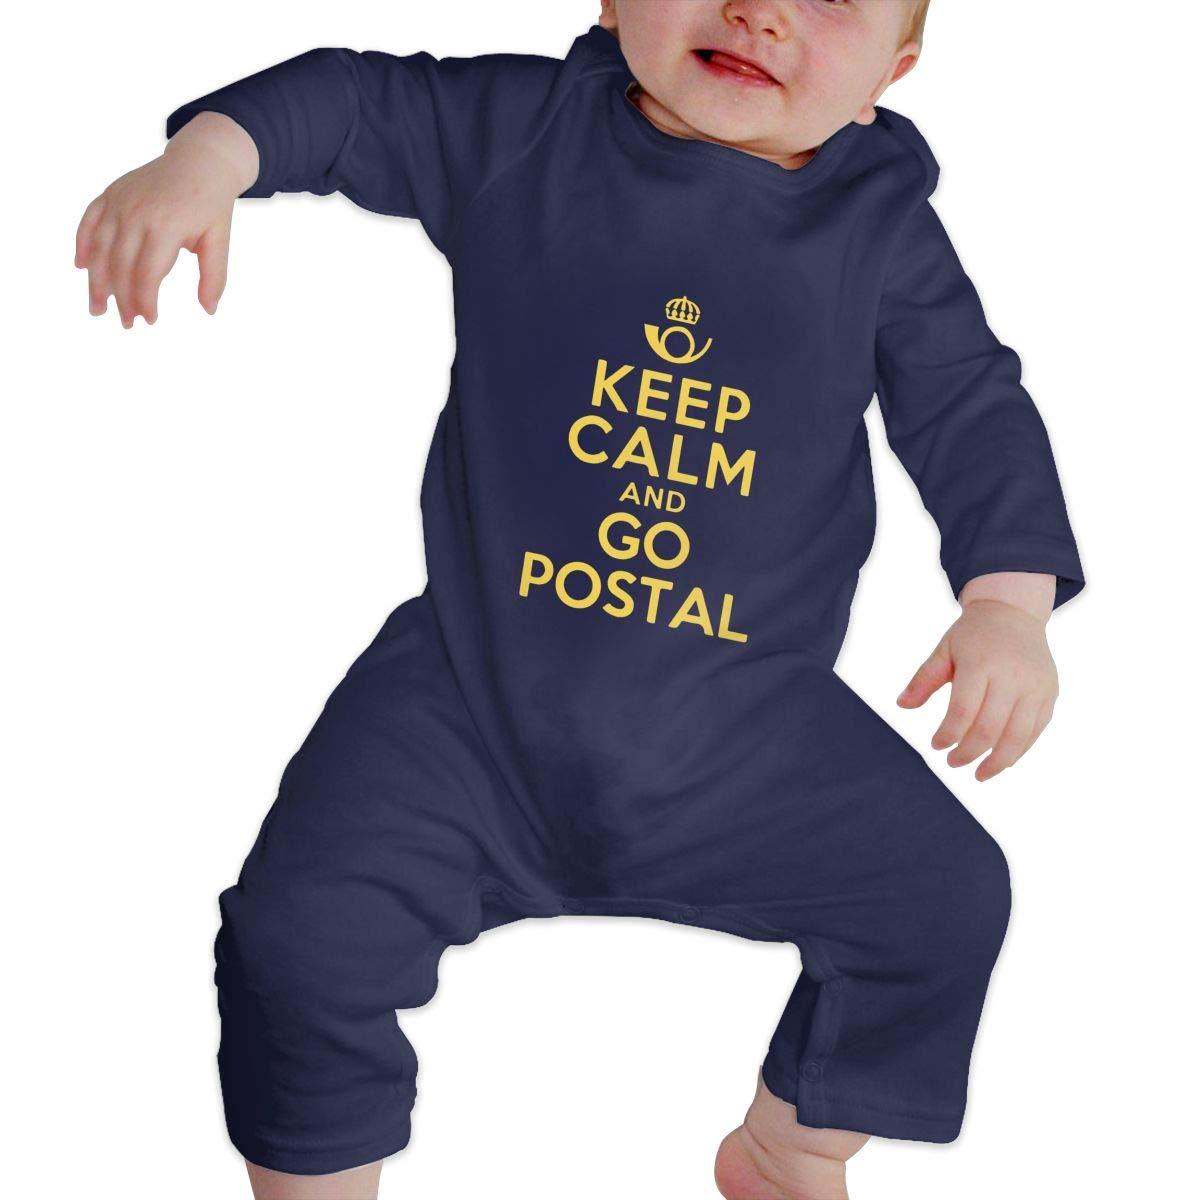 Suit 6-24 Months Q64 Newborn Round Collar Keep Calm and Go Postal Long Sleeve Bodysuits 100/% Cotton